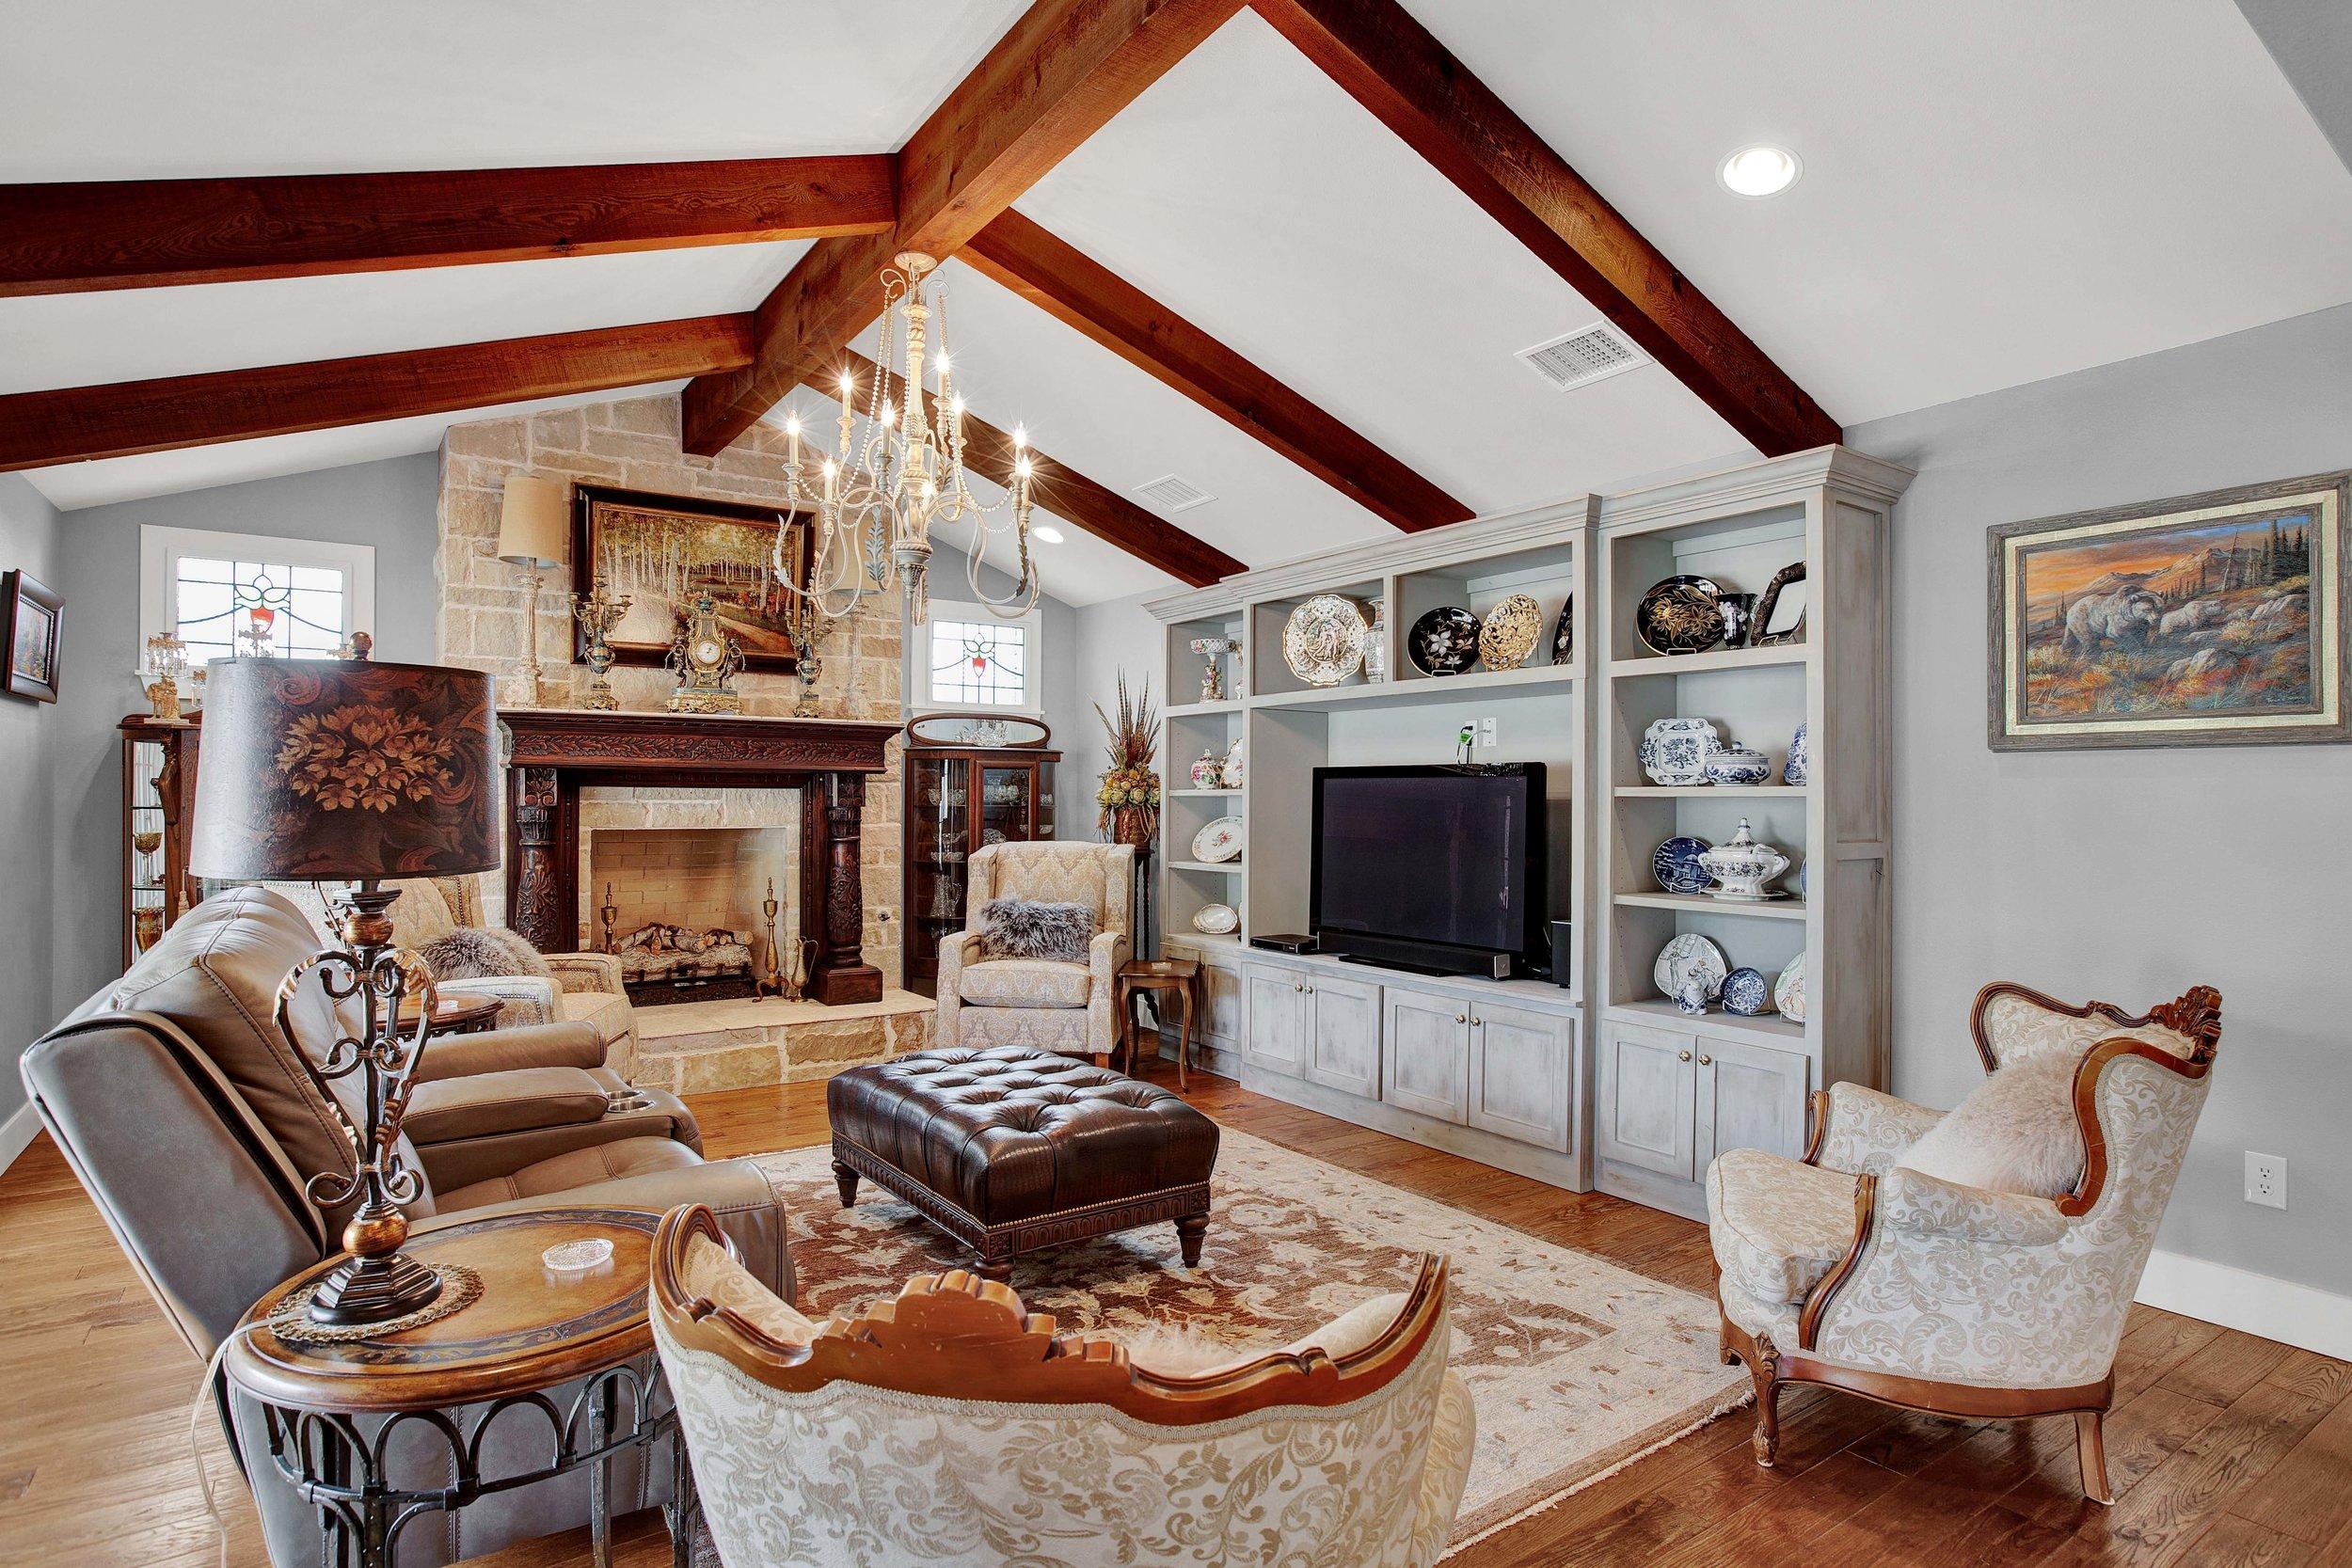 fredericksburg-realty-fredericksburg-texas-realestate-luxury-home-living-room.jpg